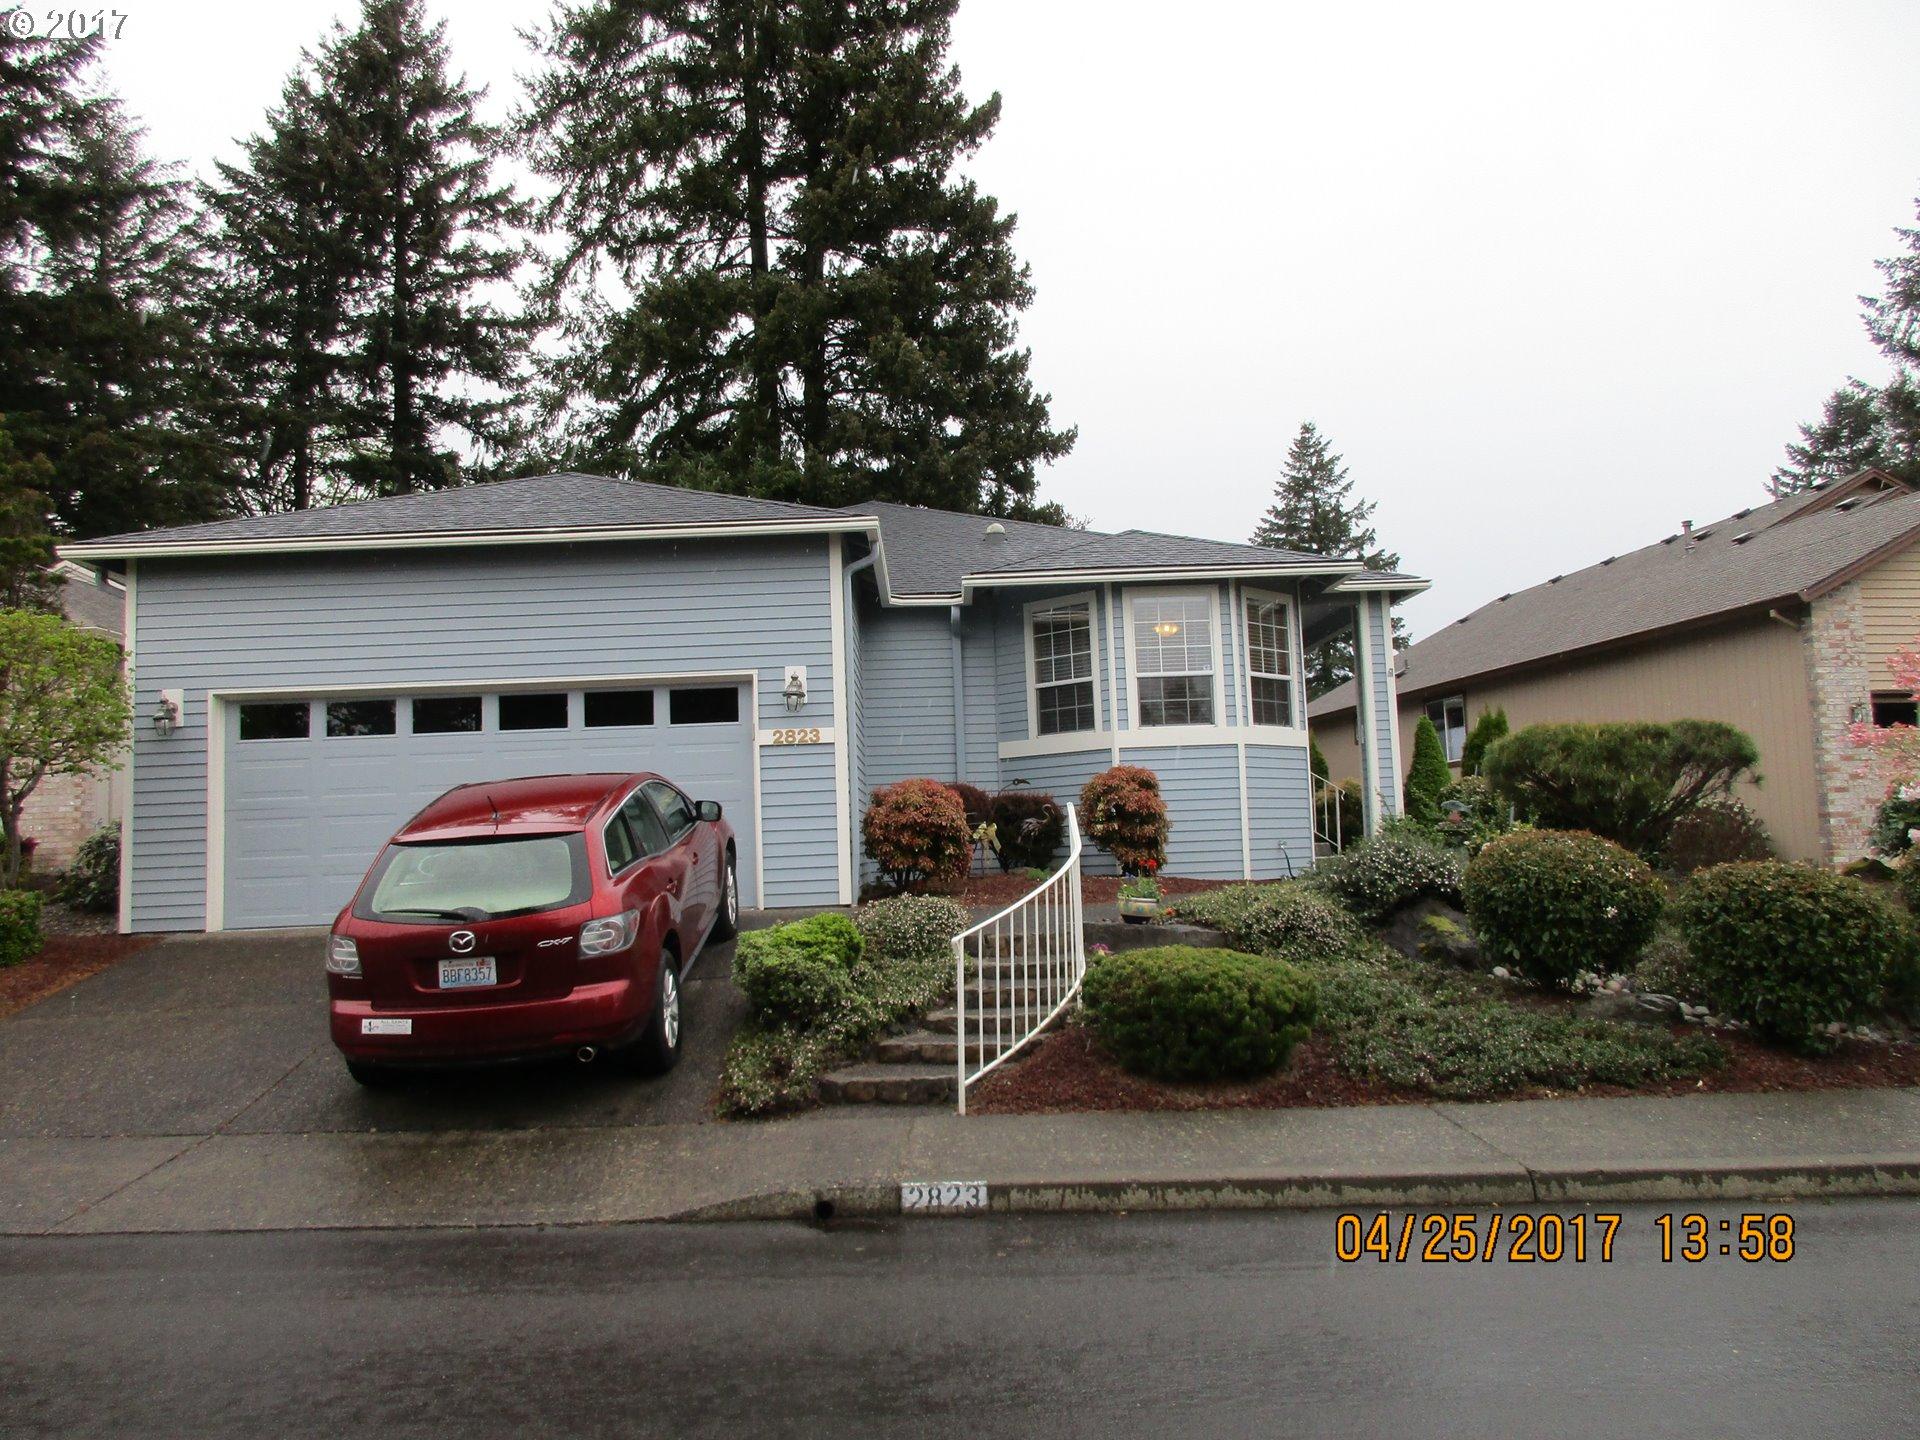 2823 SE SPYGLASS DR, Vancouver, WA 98683